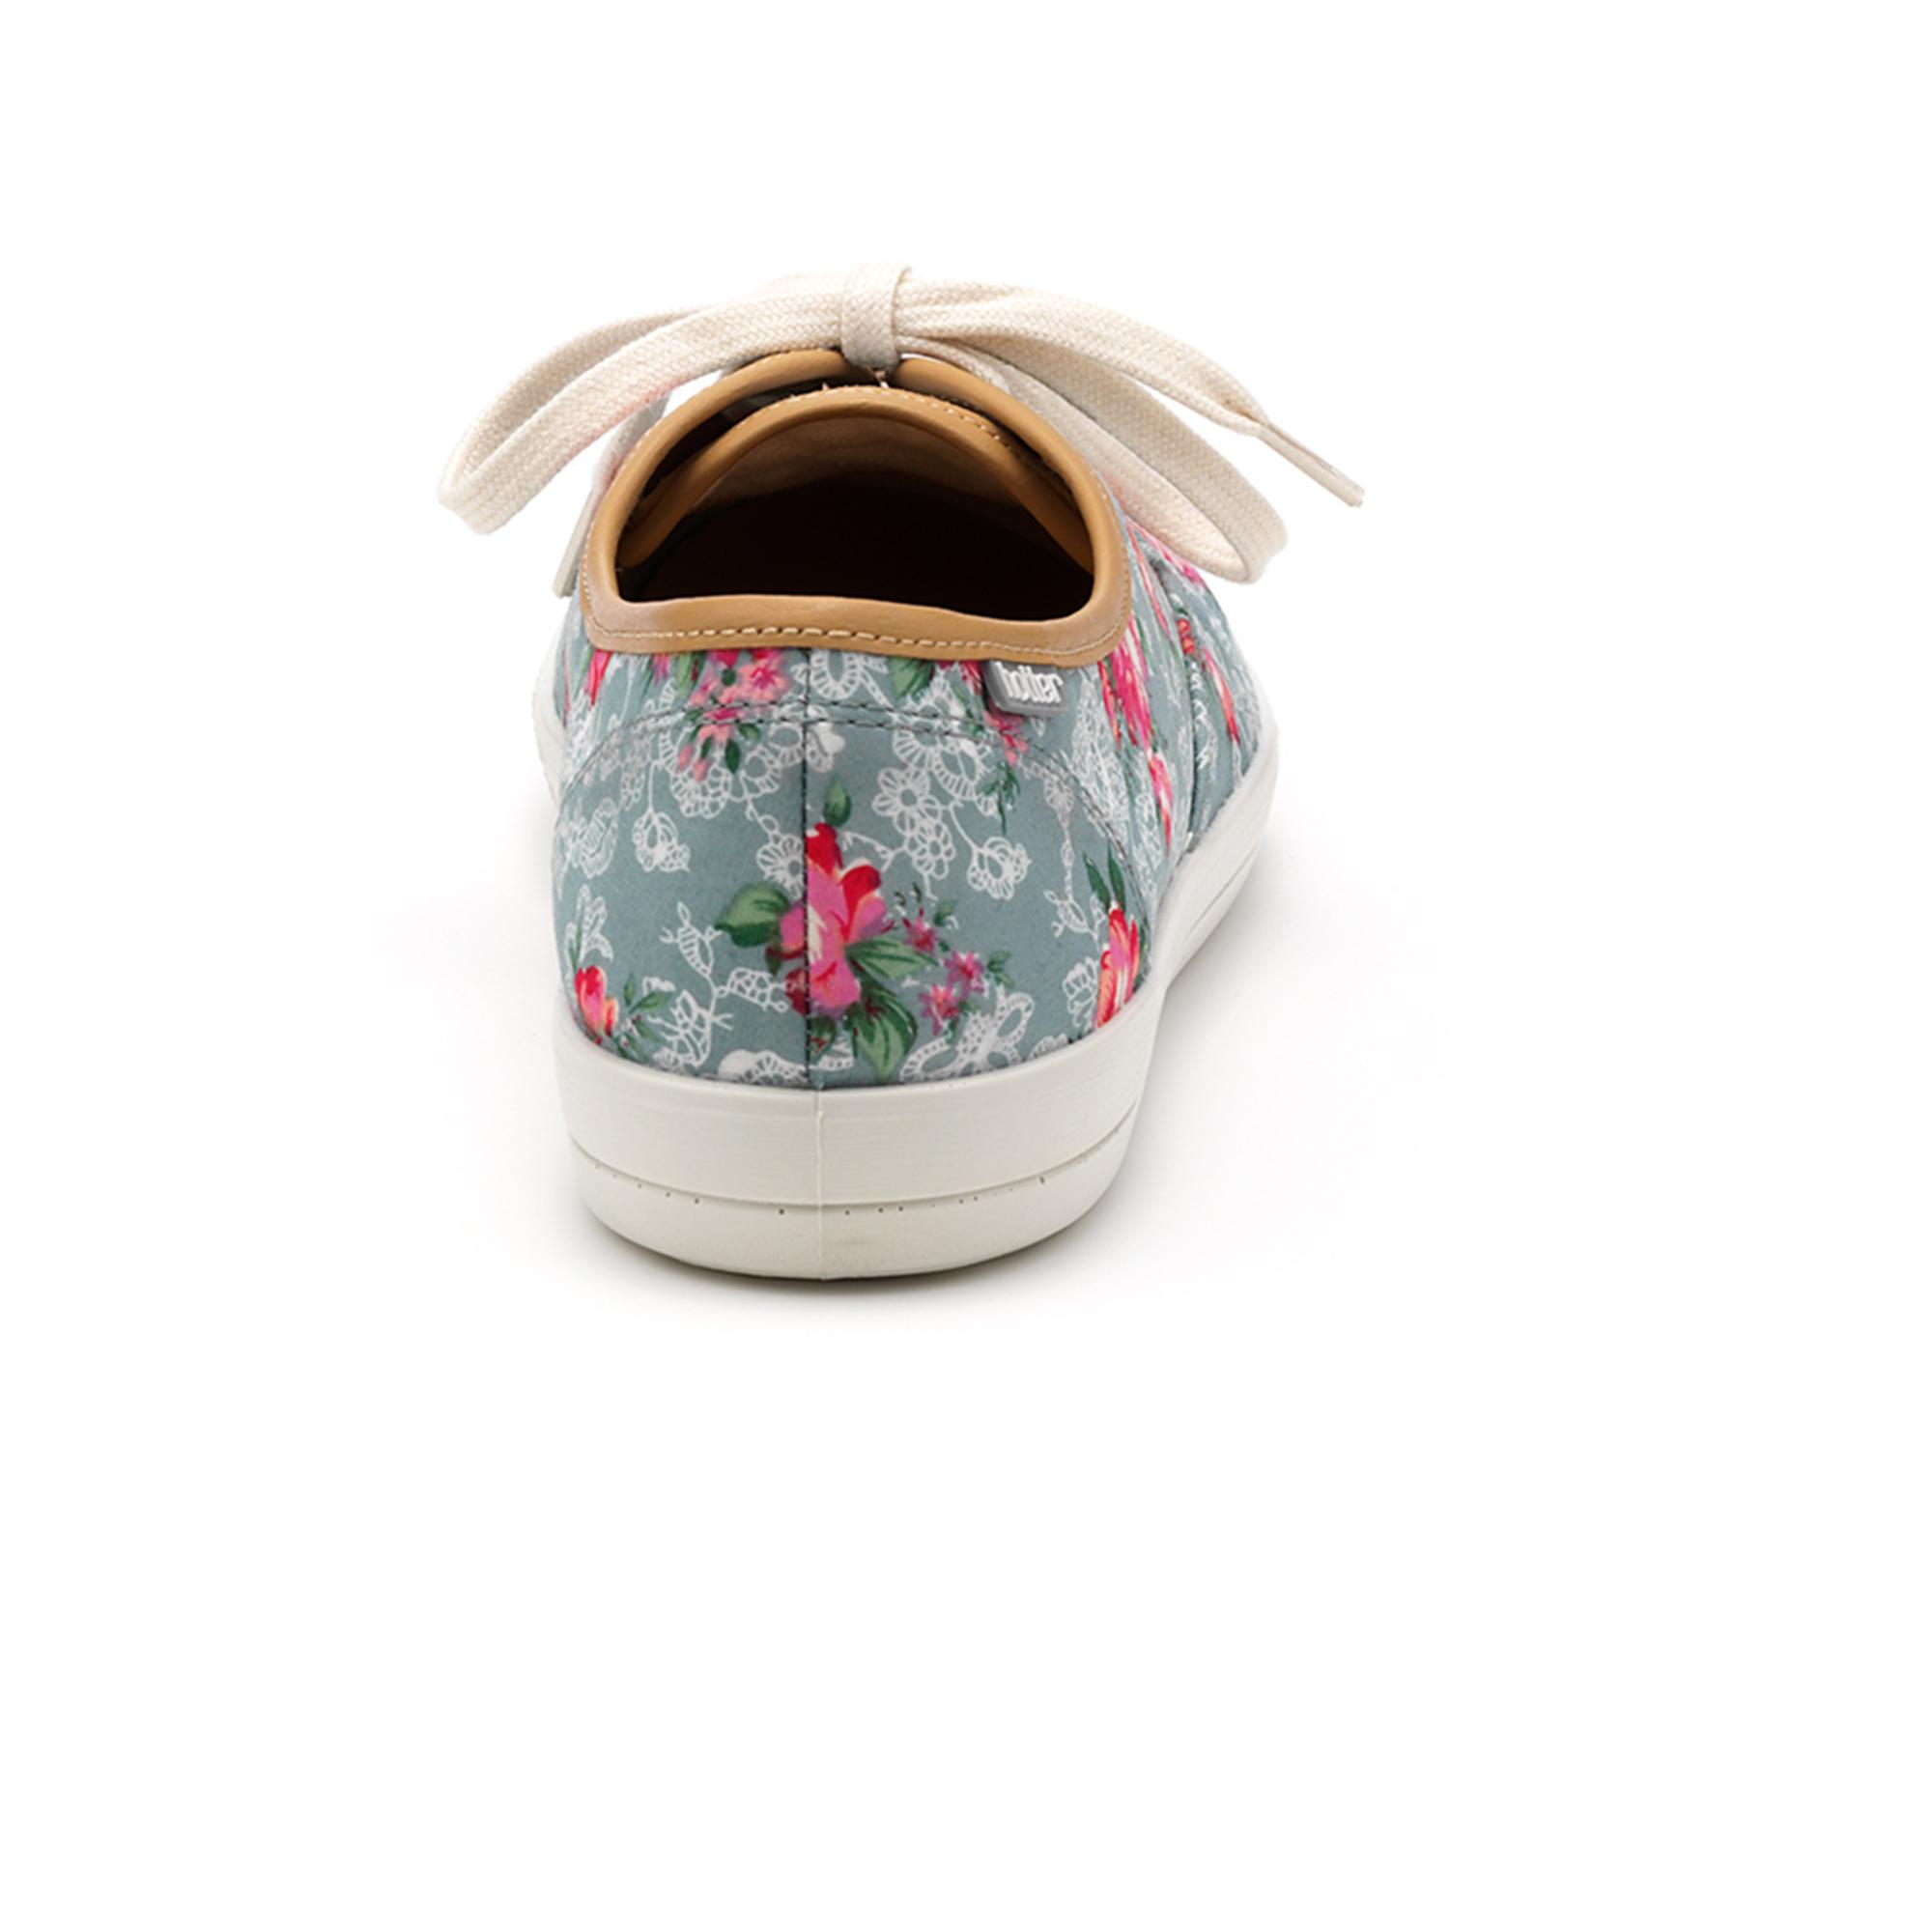 Hotter-Mujer-Mabel-Senoras-Textile-Con-Cordones-Zapatos-Calzado-Zapatillas